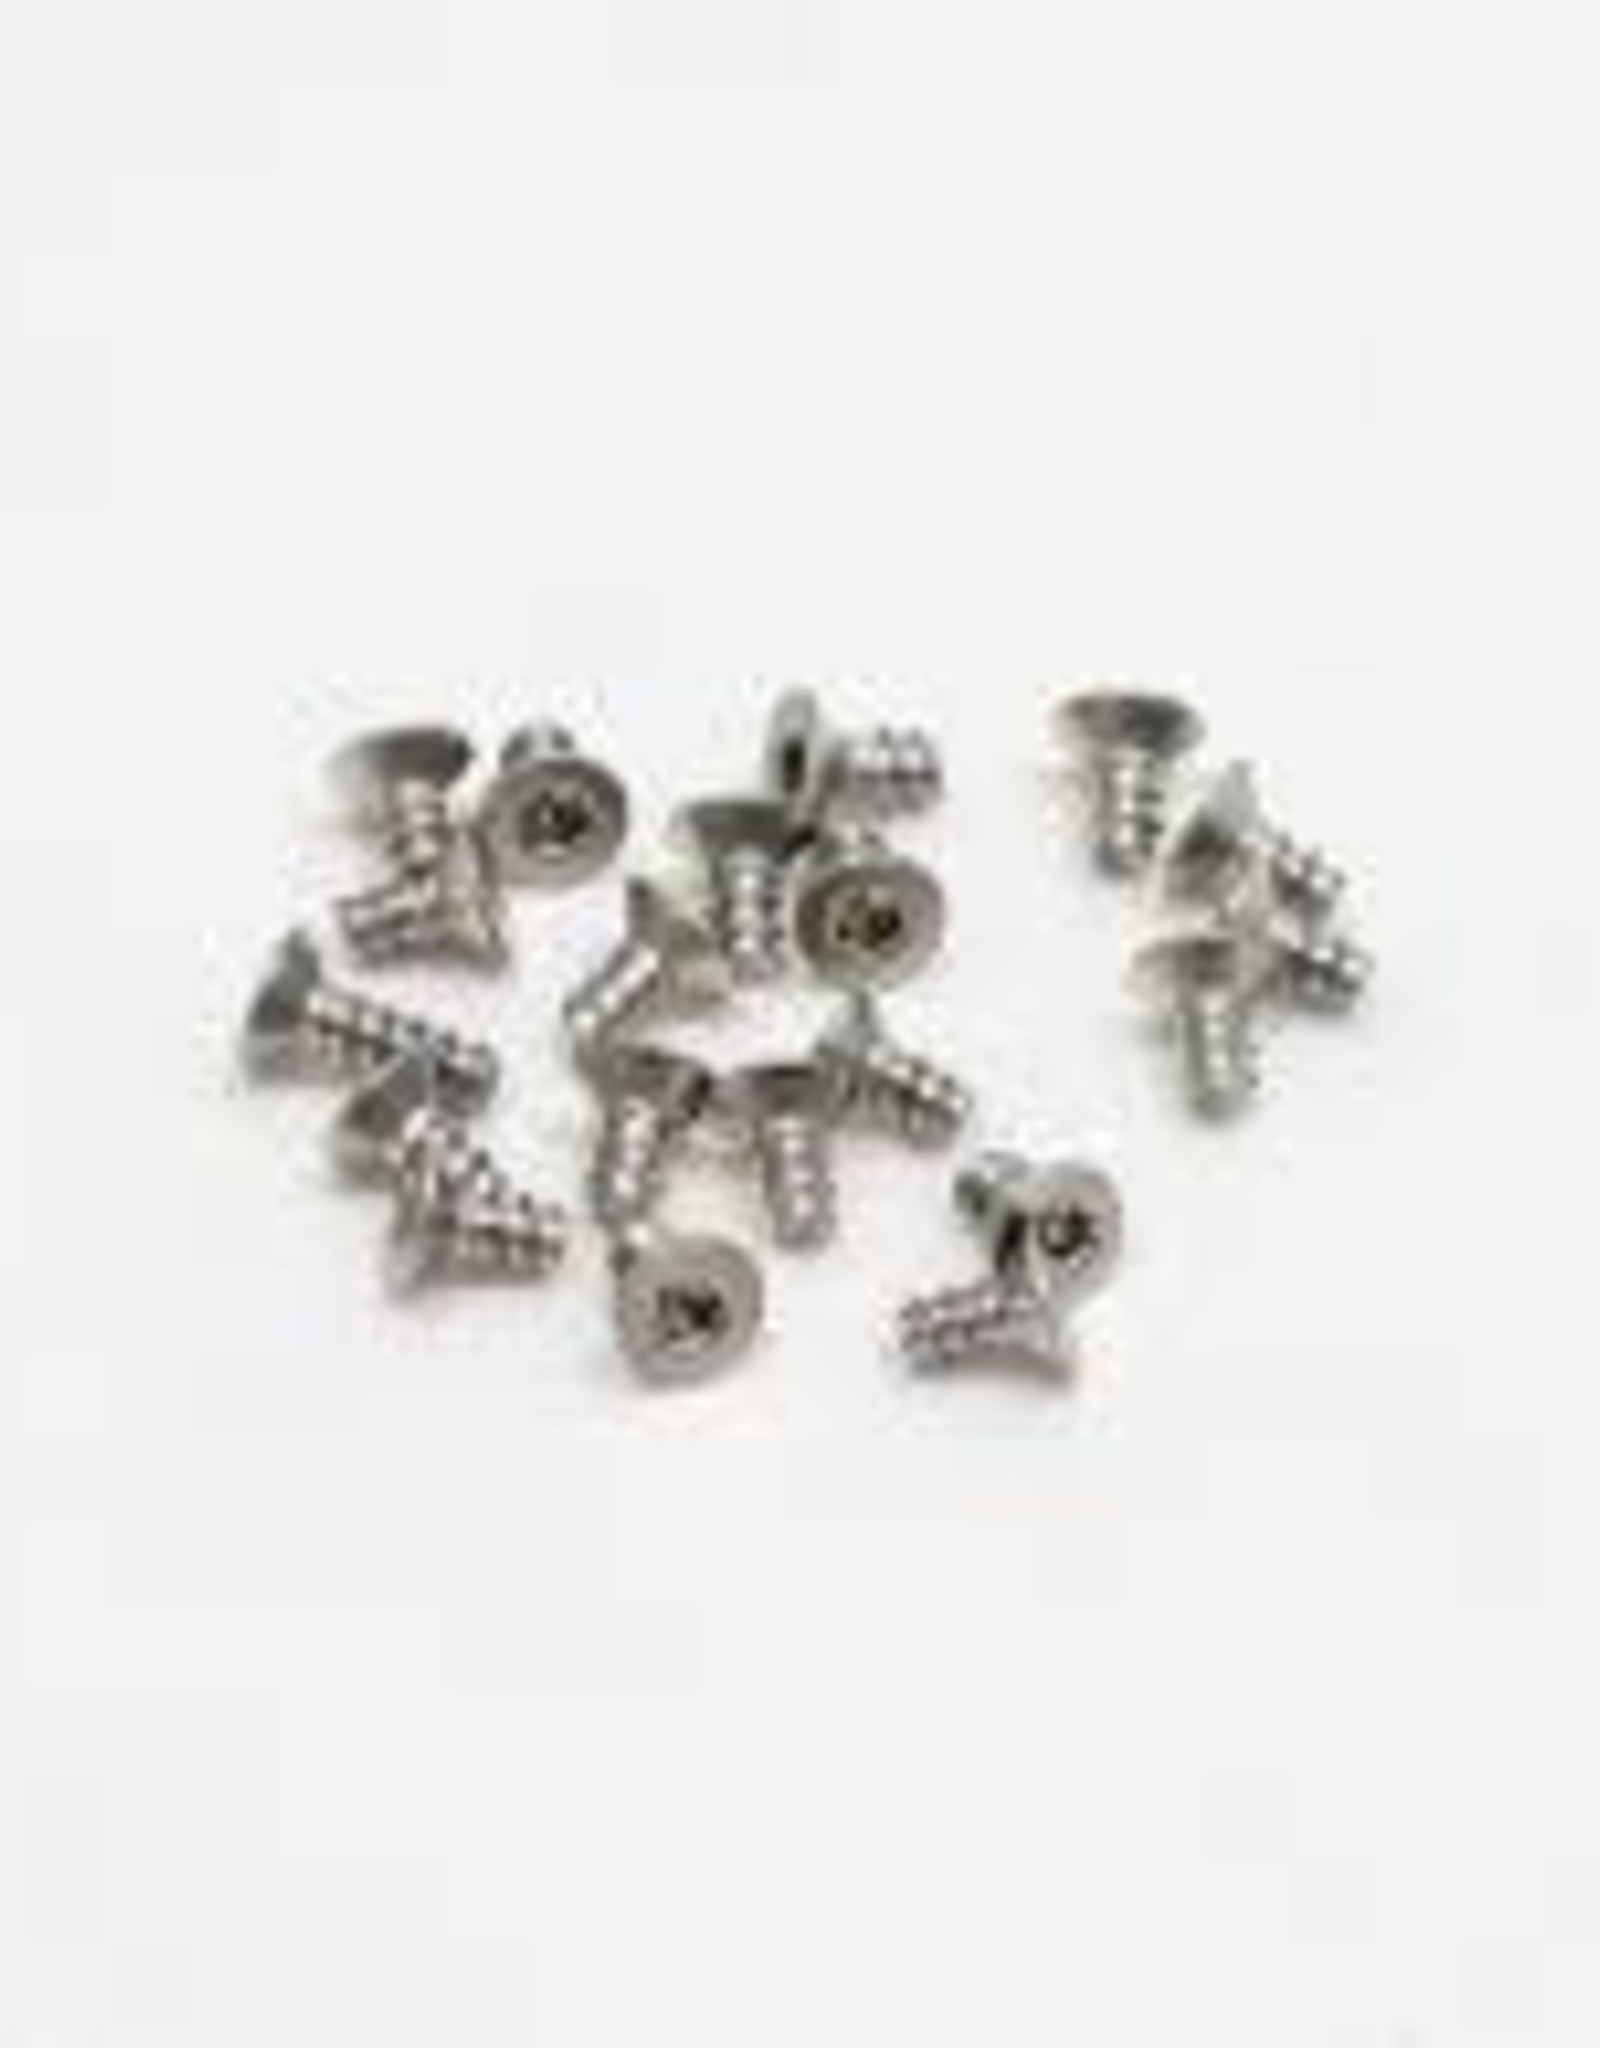 PN Racing PN Racing M2x4 Countersink Stainless Steel Hex Plastic Screw (20pcs)